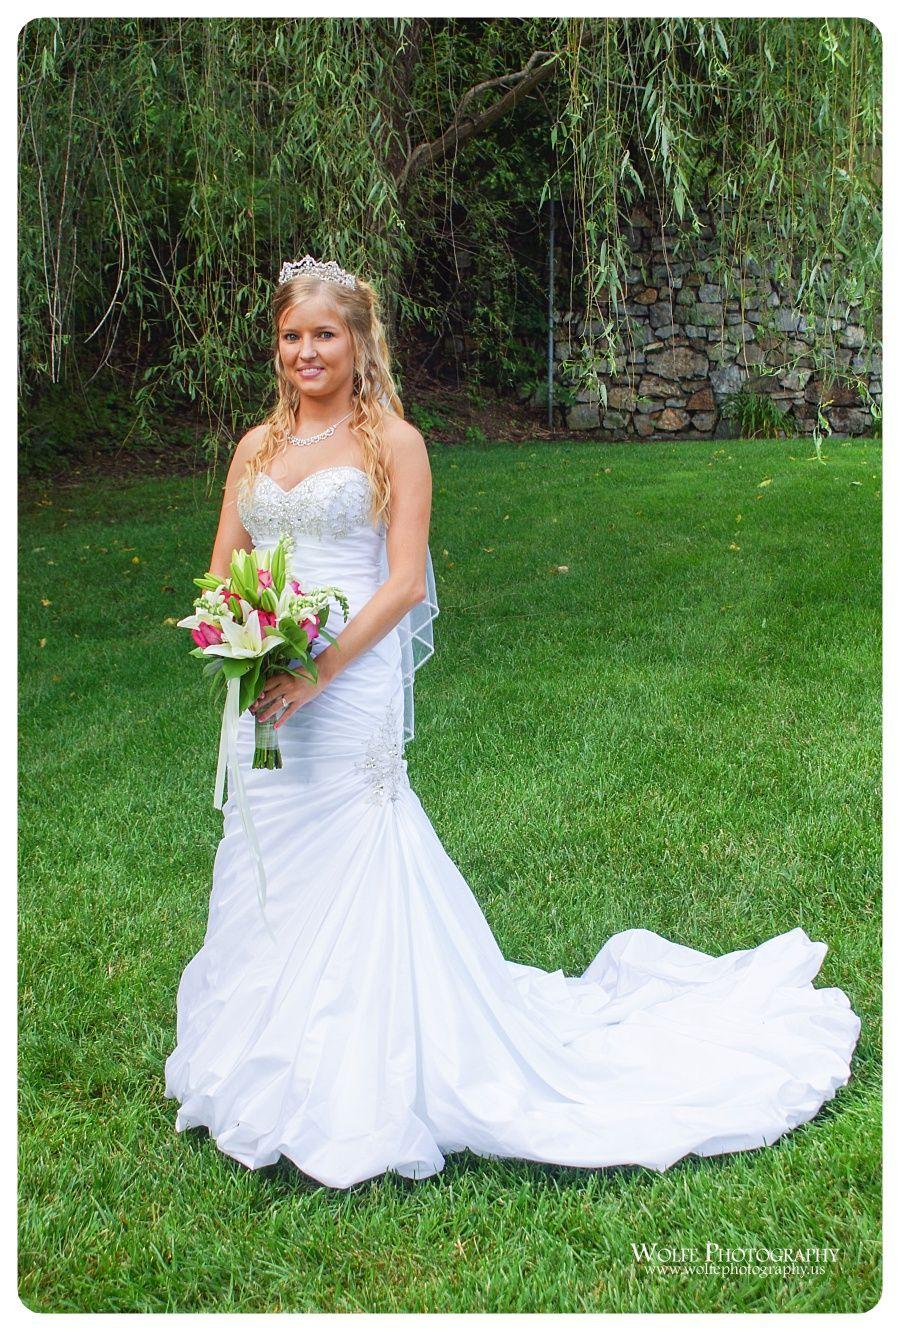 Woodland Wedding Photography: The Woodland Place, Vinton, Virginia